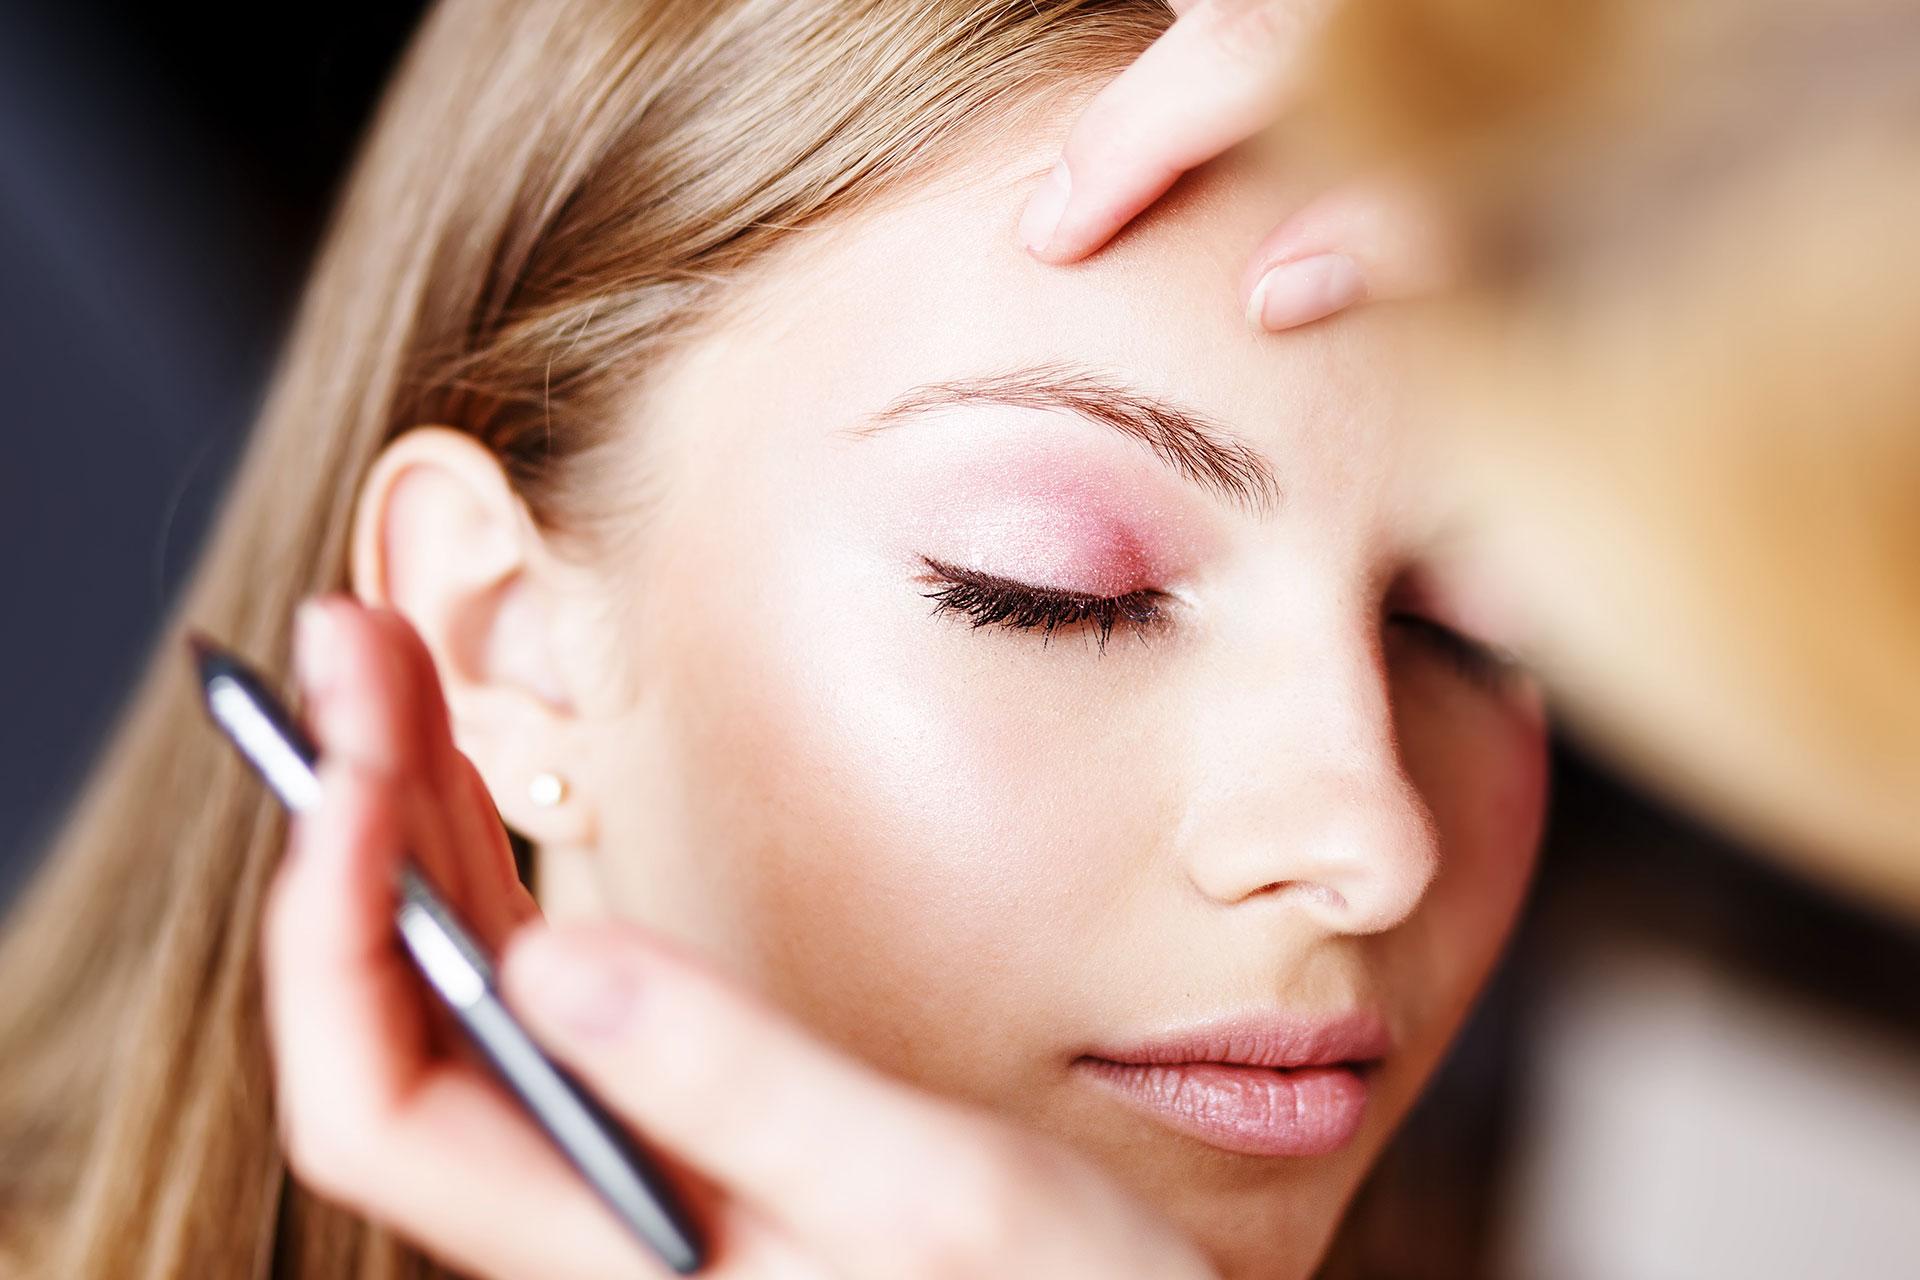 Centro Benessere Debora Bagnacavallo makeup